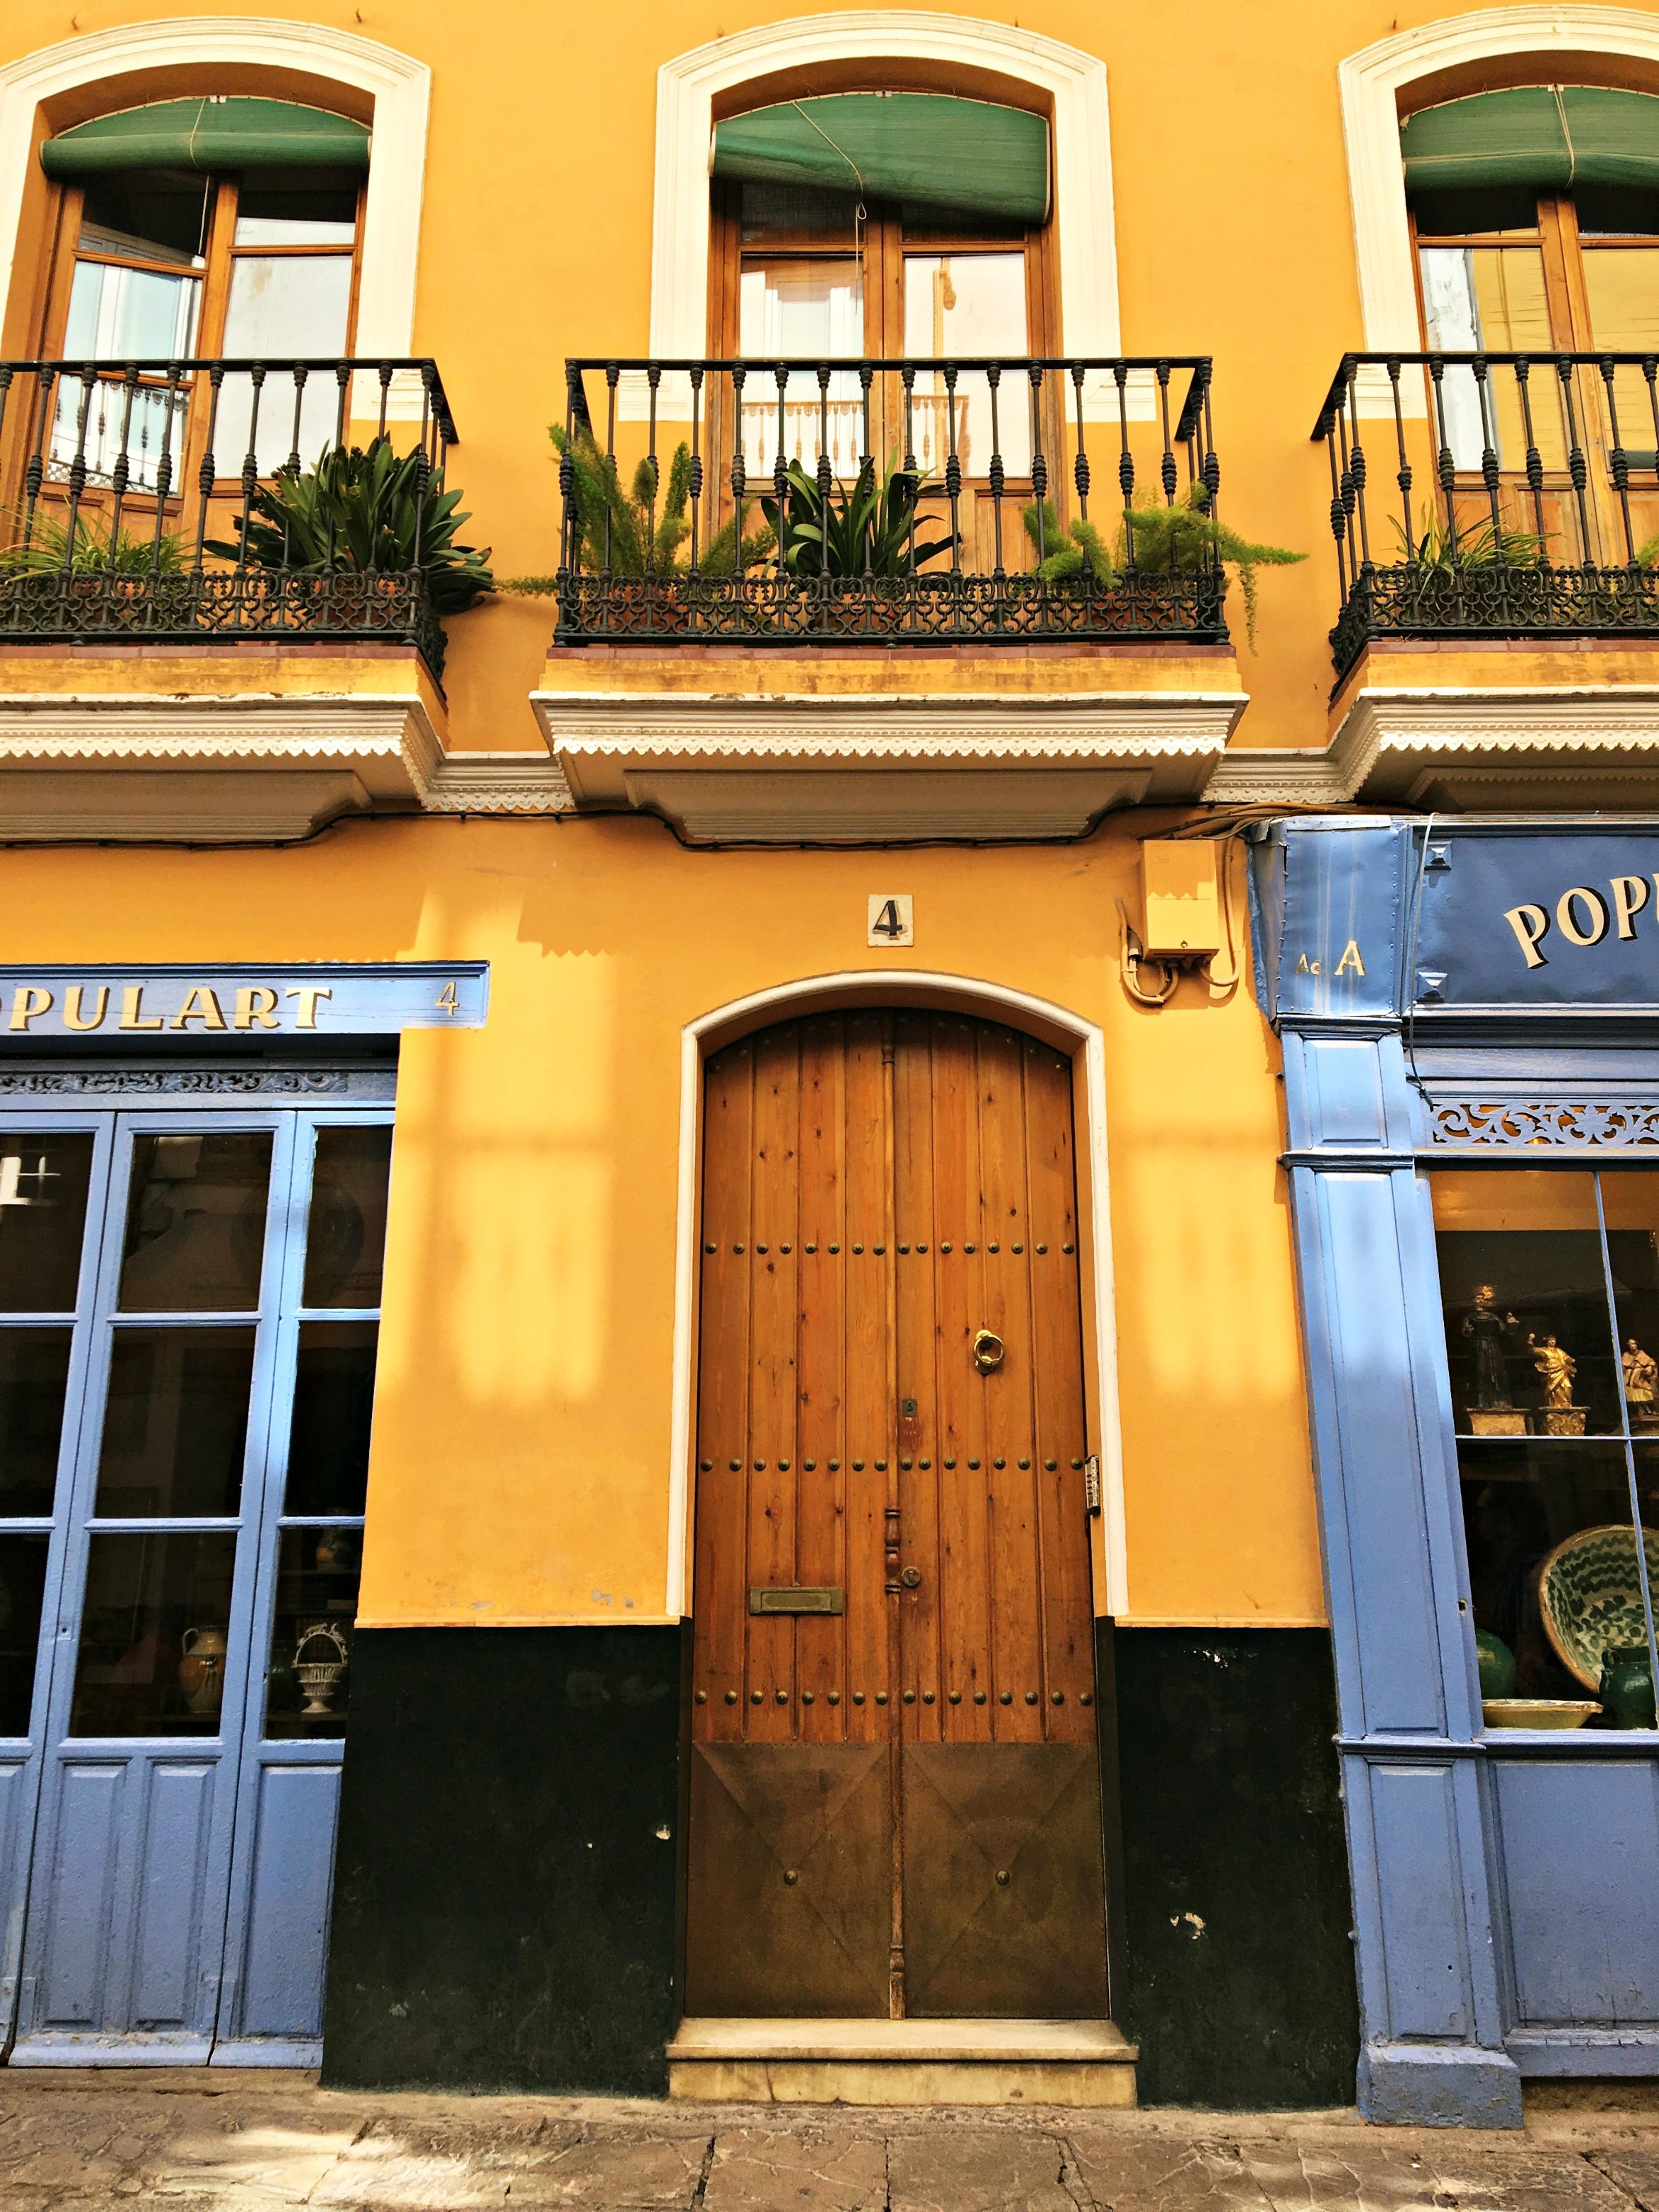 old-town-sevilla-spain-architecture